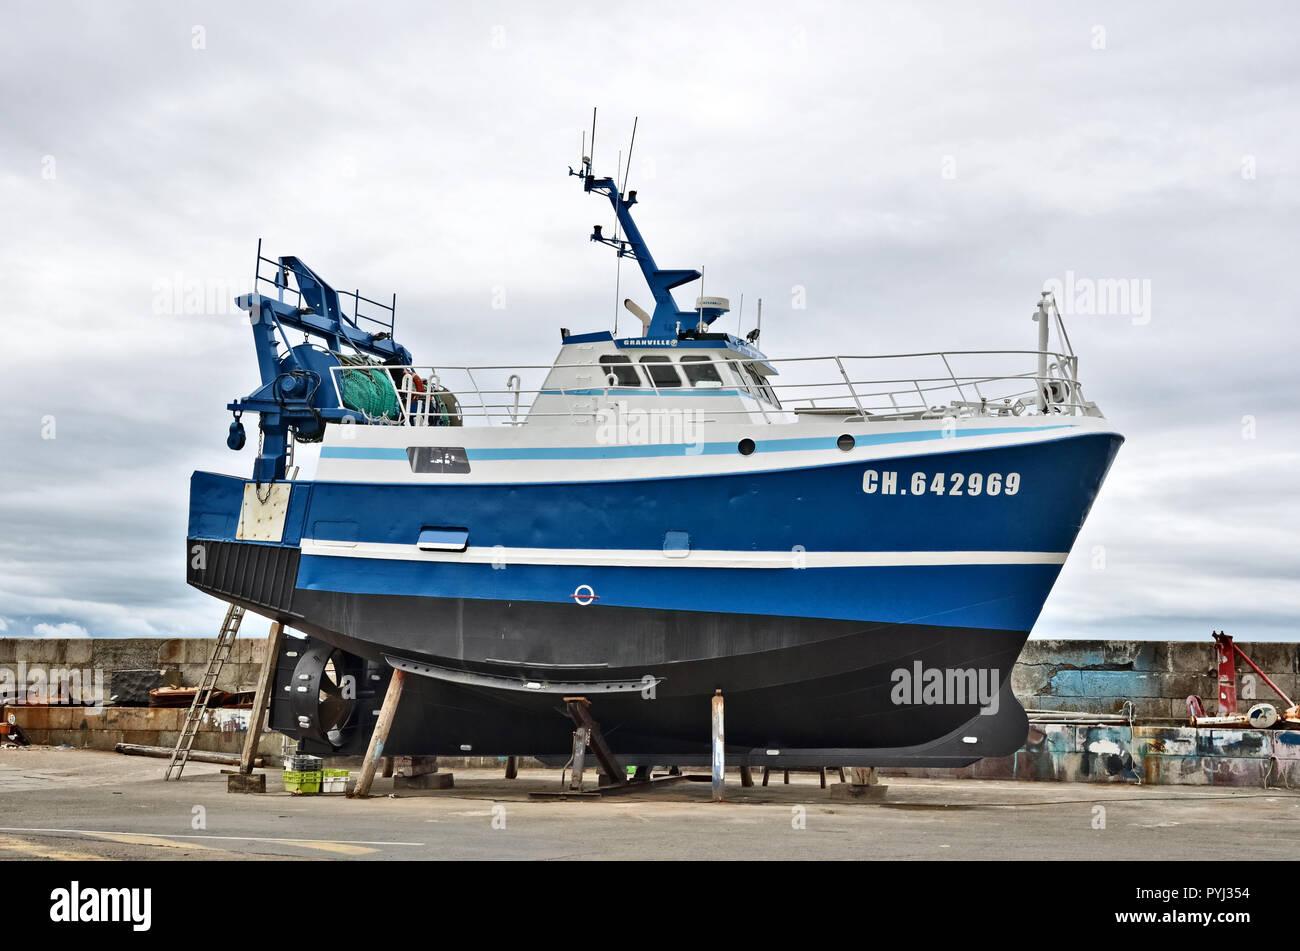 Trawler 'Galapagos' - Stock Image